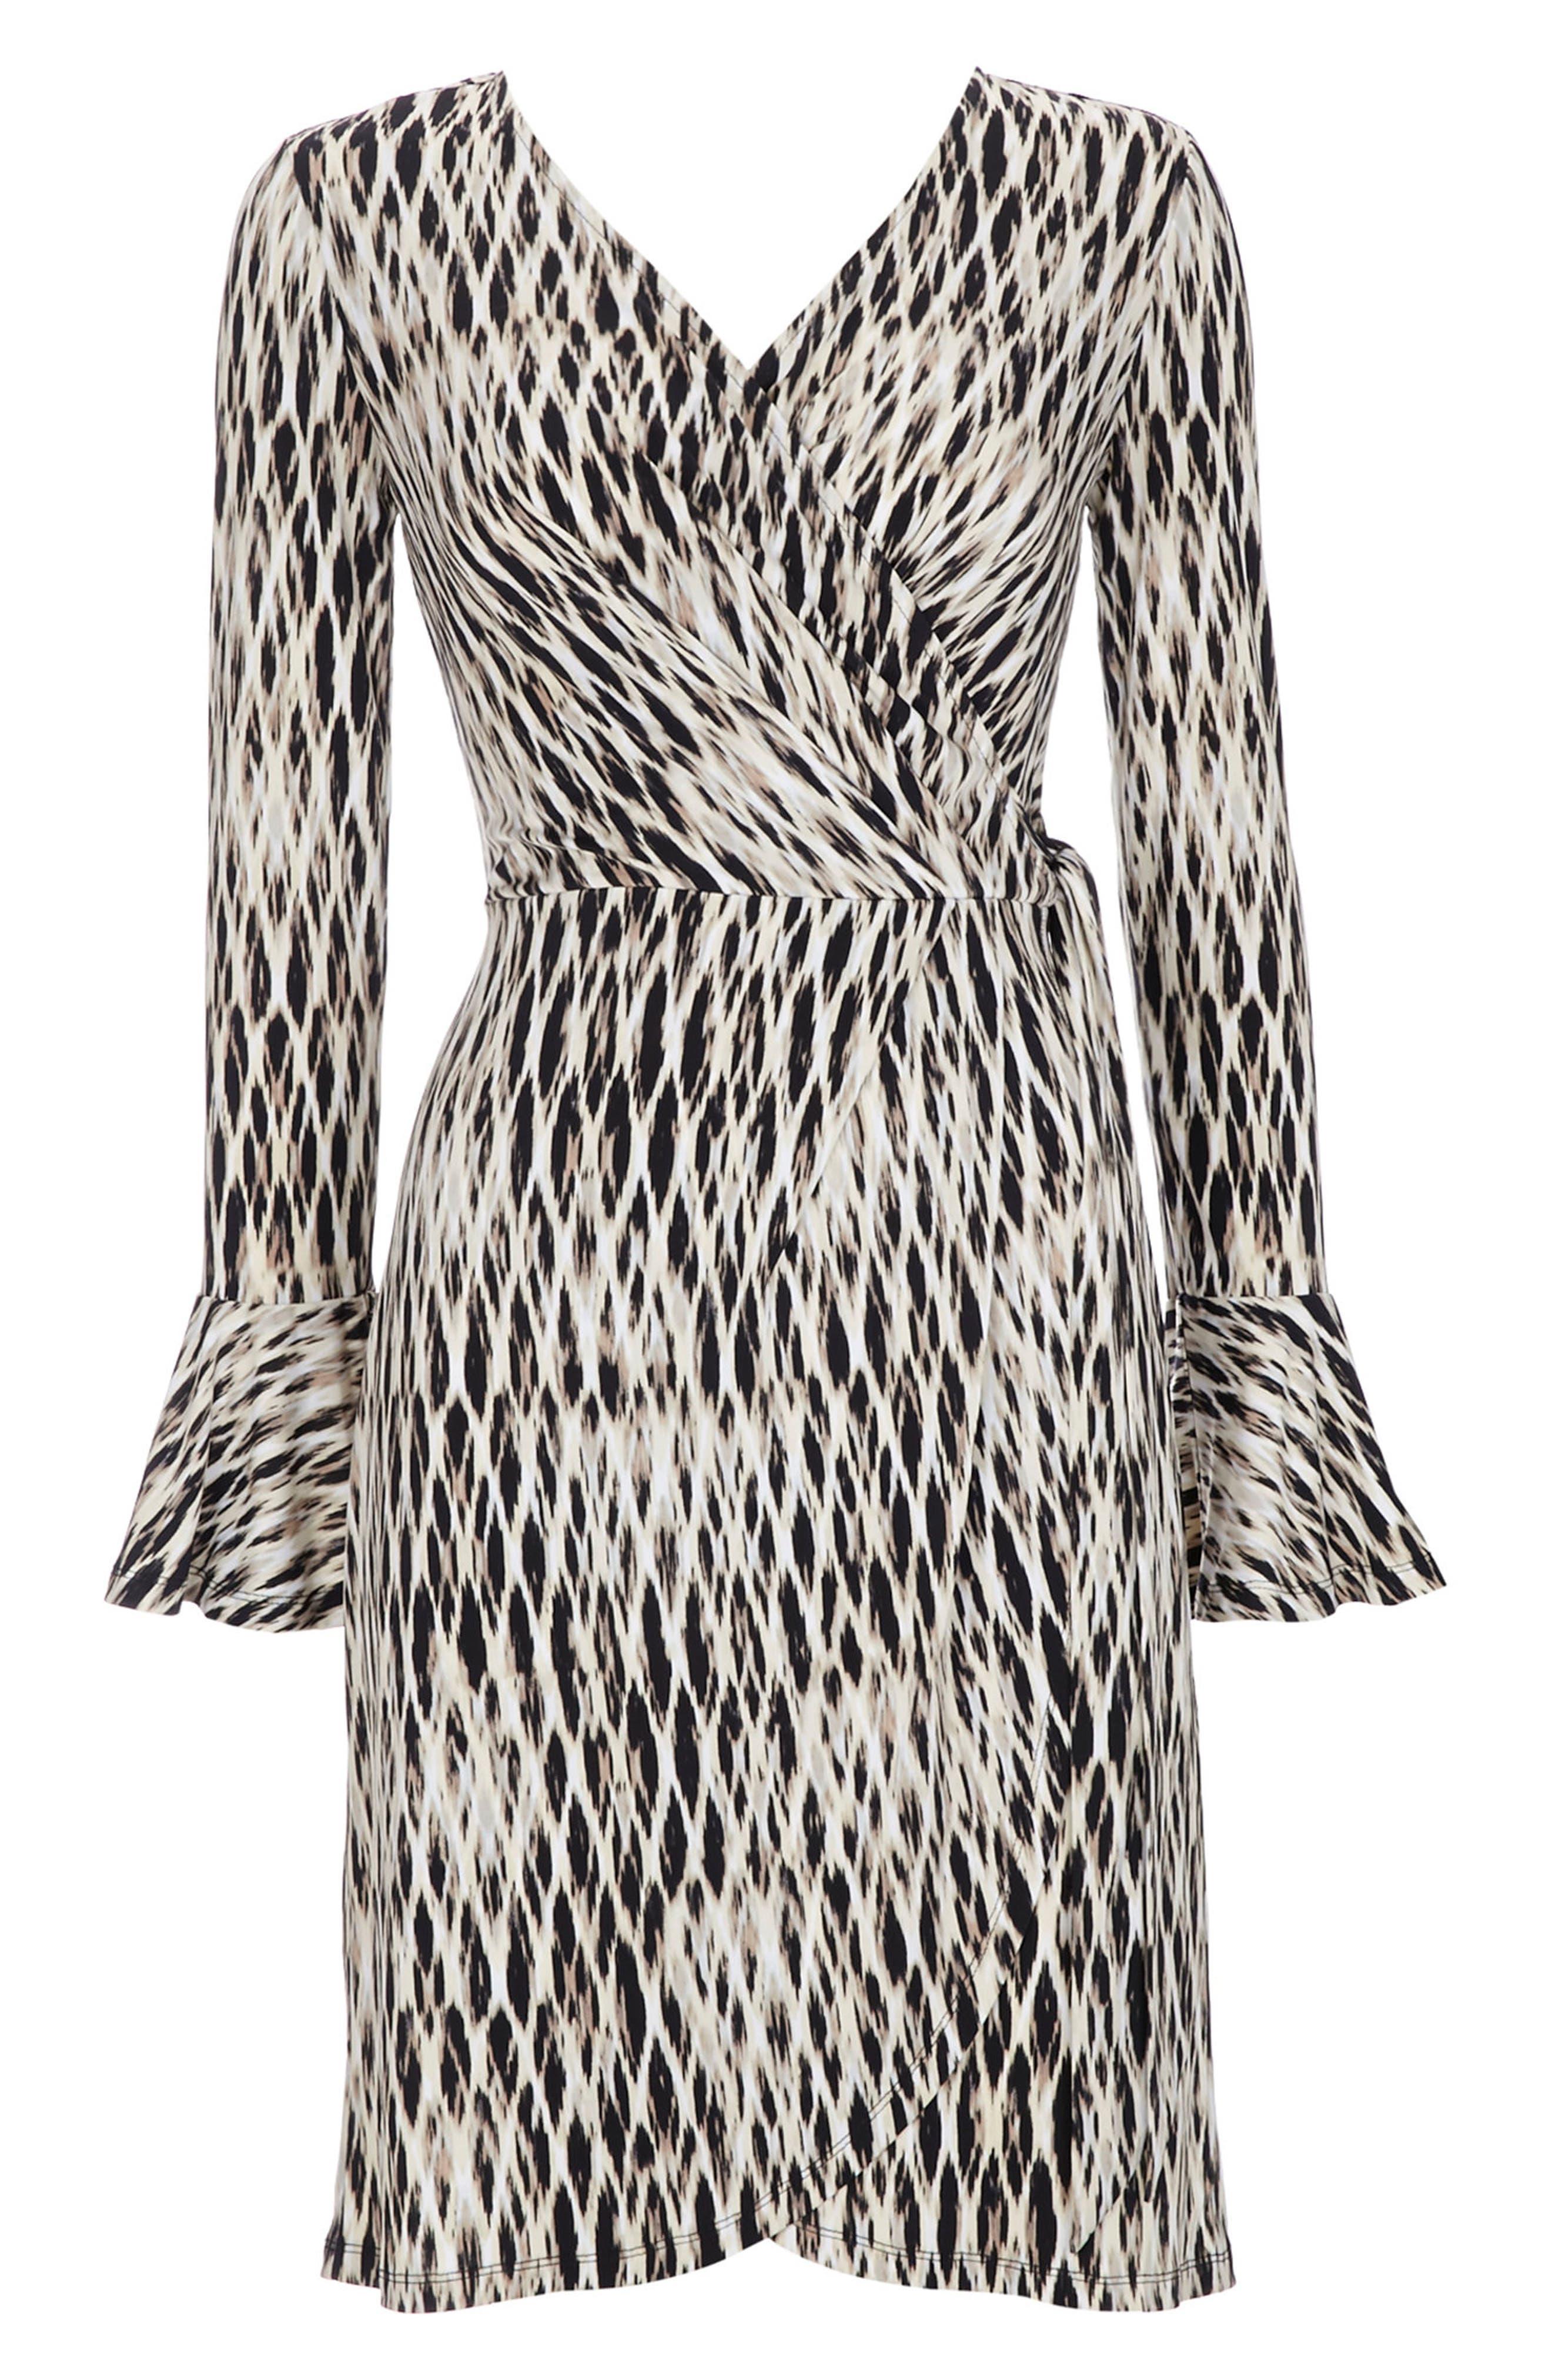 Geo Print Bell Sleeve Wrap Dress,                             Alternate thumbnail 5, color,                             001